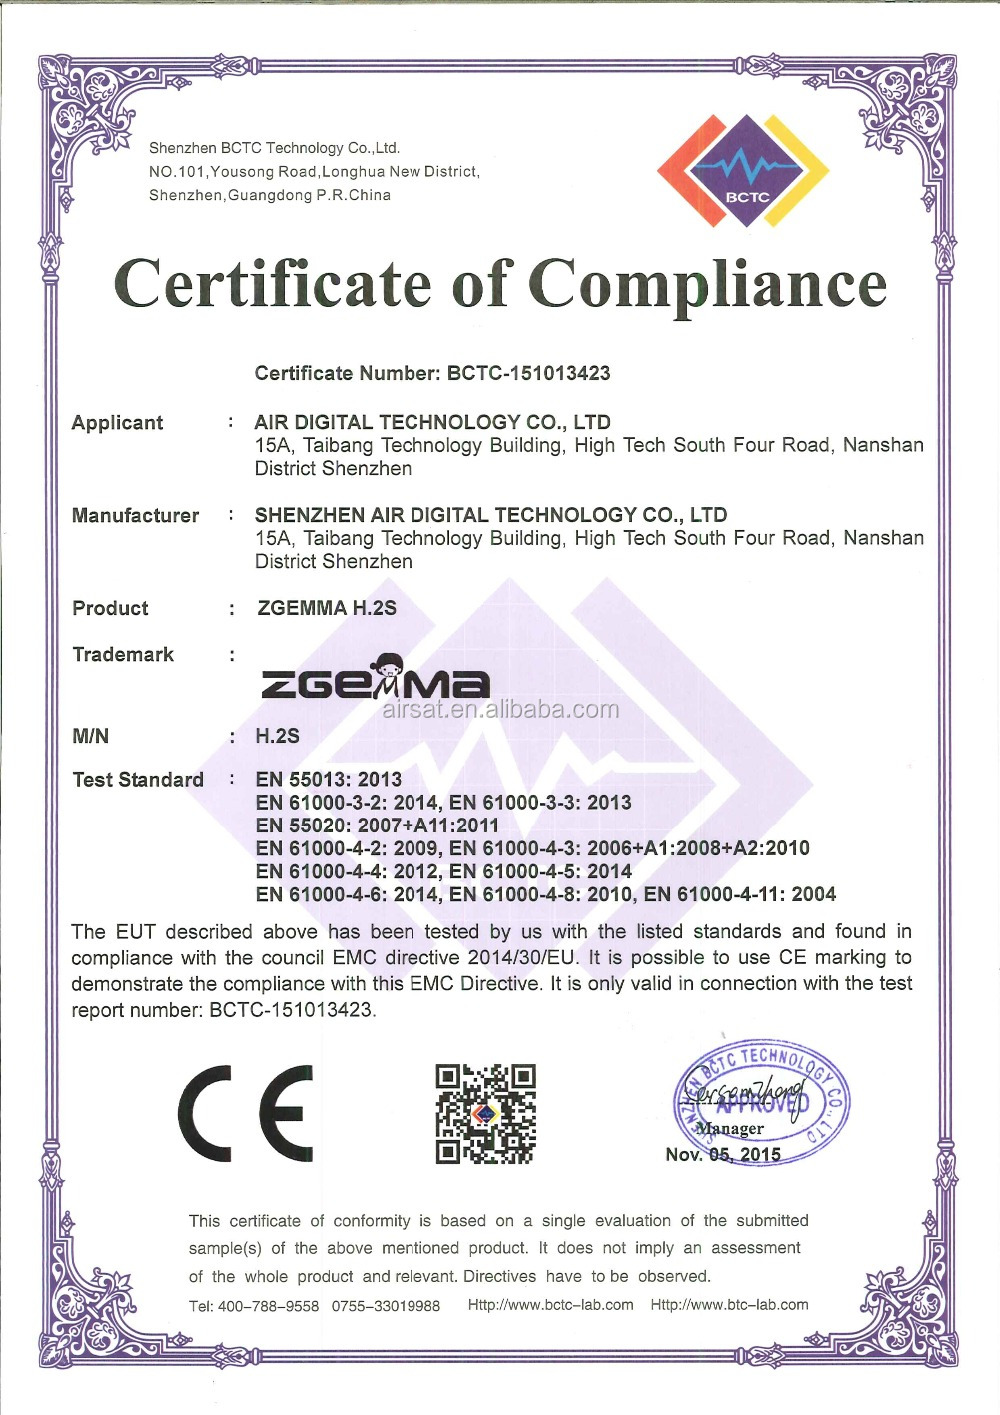 Zgemma H 2s Webtv Mpeg-4 Twin Dvb-s2 Full Hd Download Software For Receiver  - Buy Www Youtube Com,Zgemma H 2s,Star Sat Satellite Receiver Product on